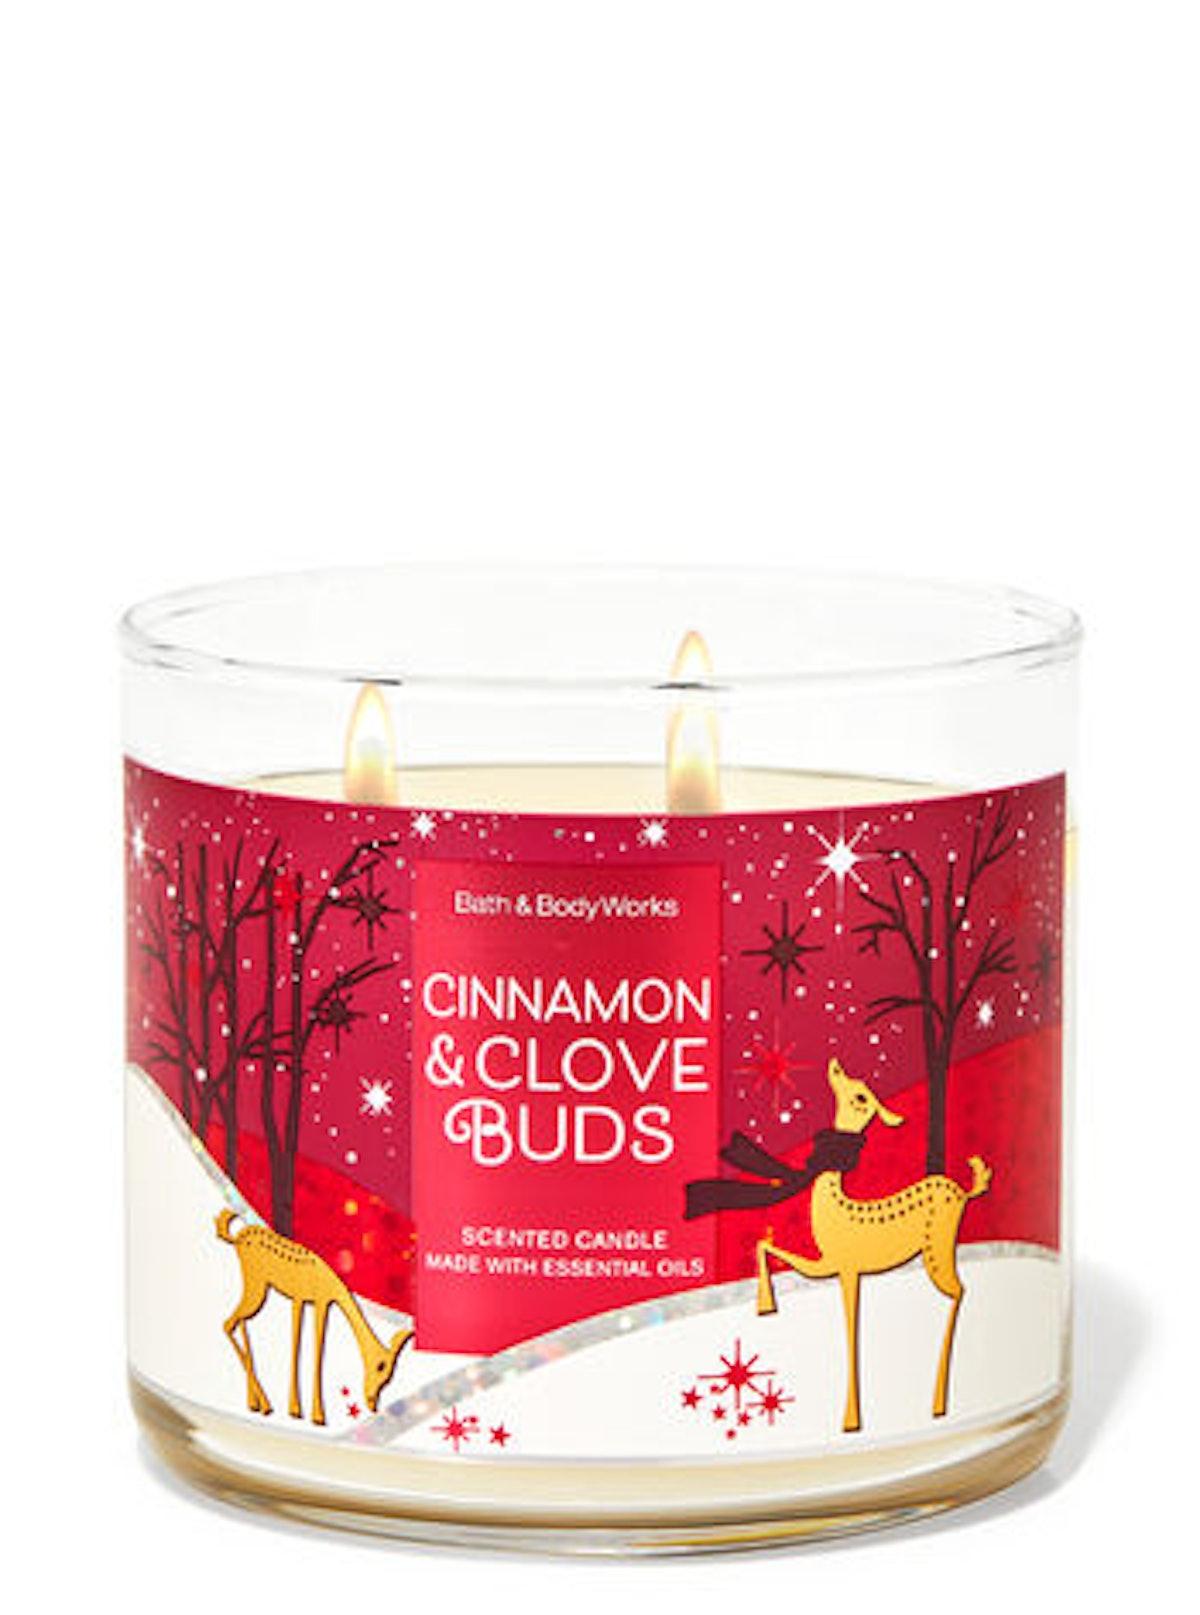 Cinnamon Clove Buds Three-Wick Candle